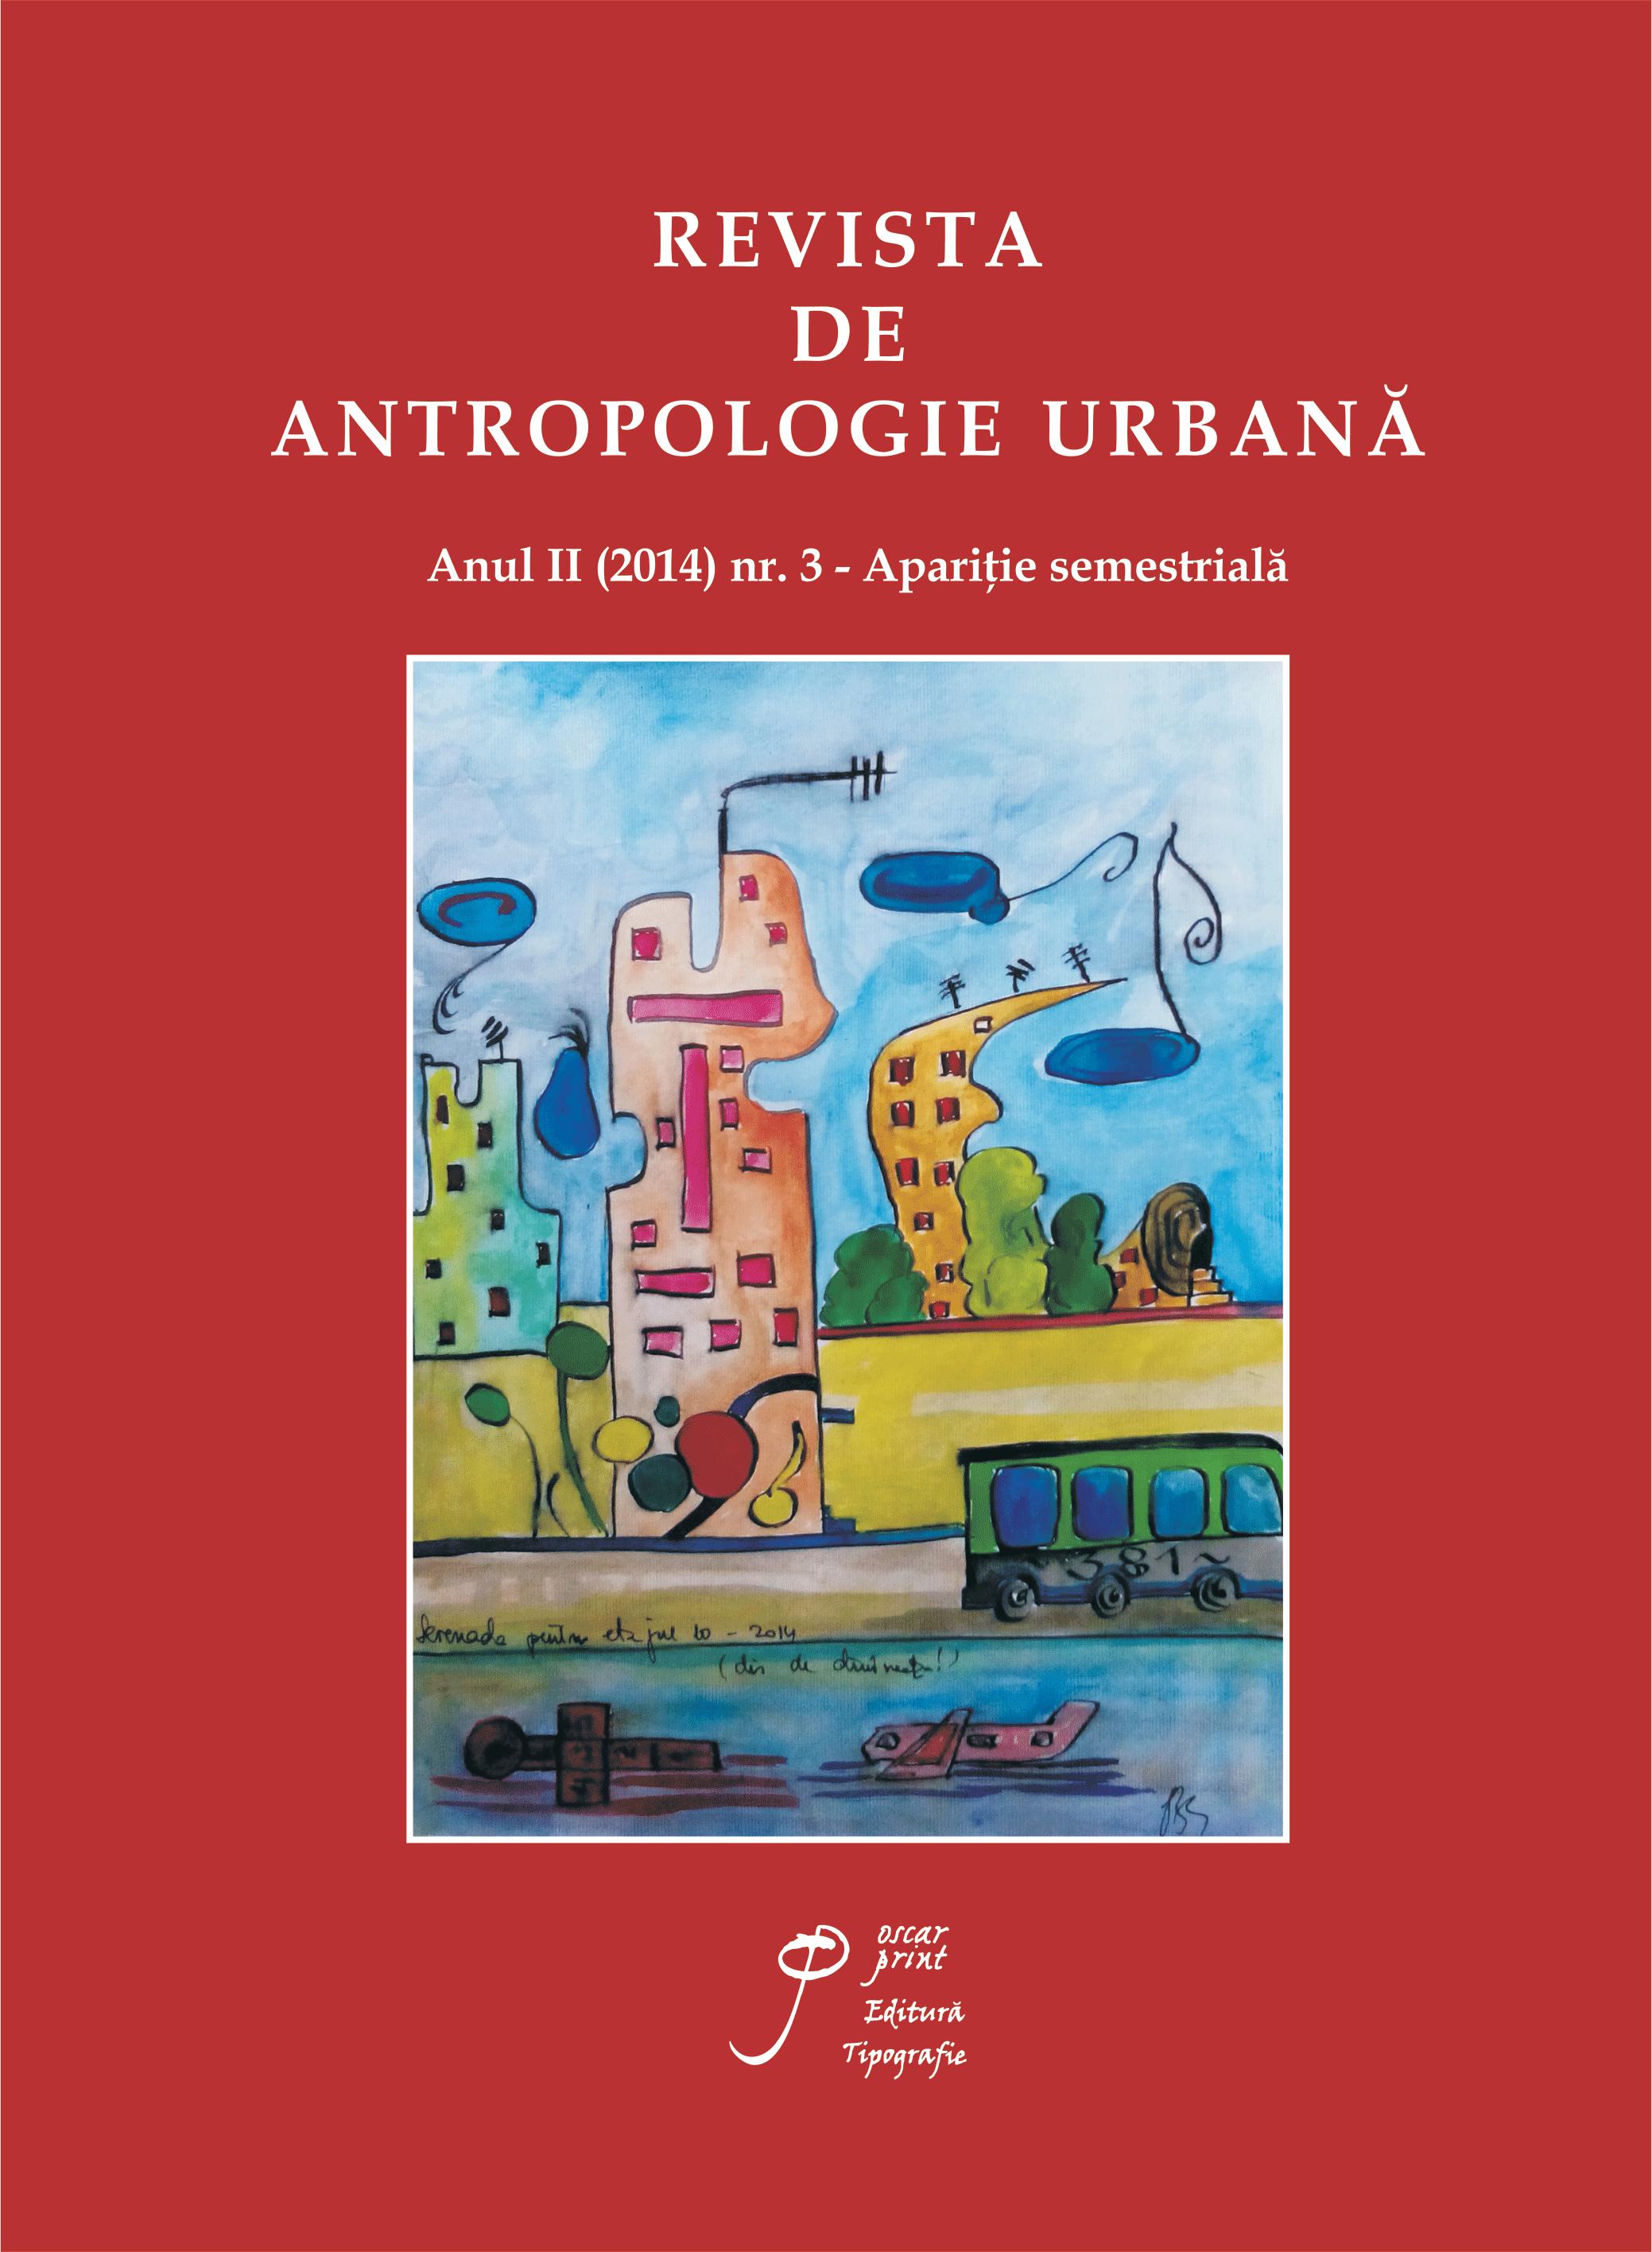 Revista de Antropologie Urbană Nr.3